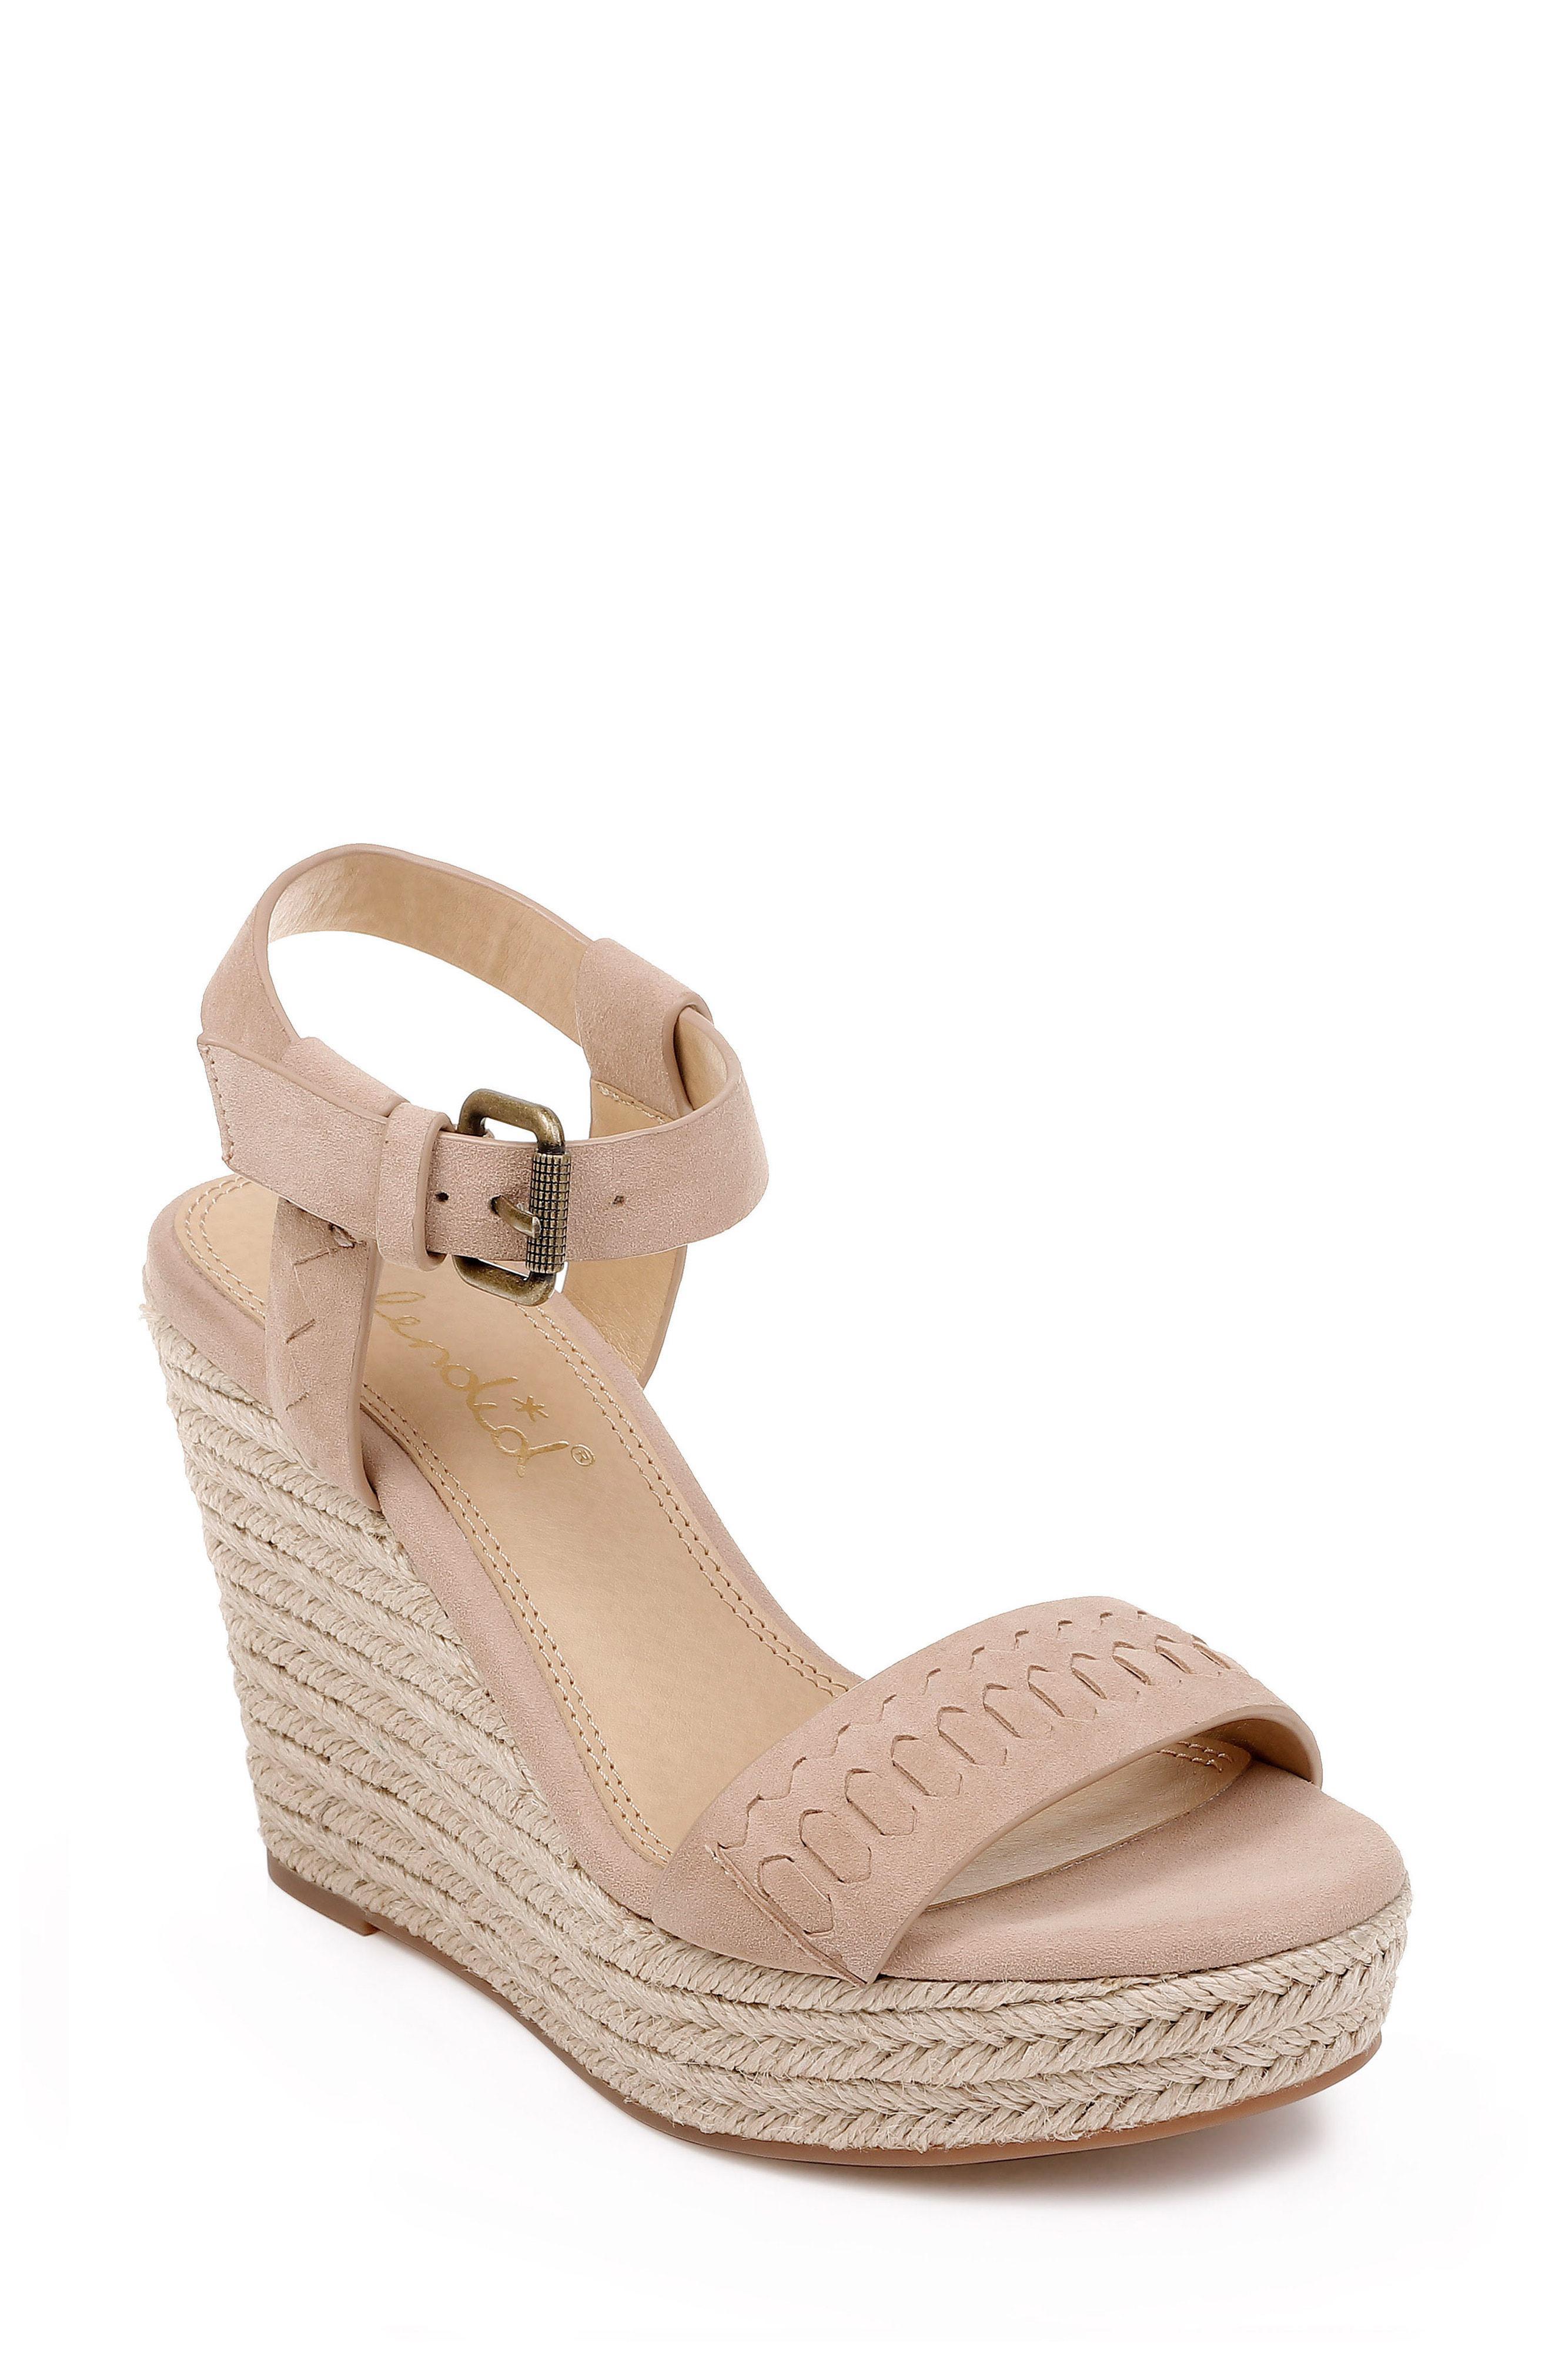 c7d472ea276 Splendid. Women s Shayla Woven Wedge Sandal